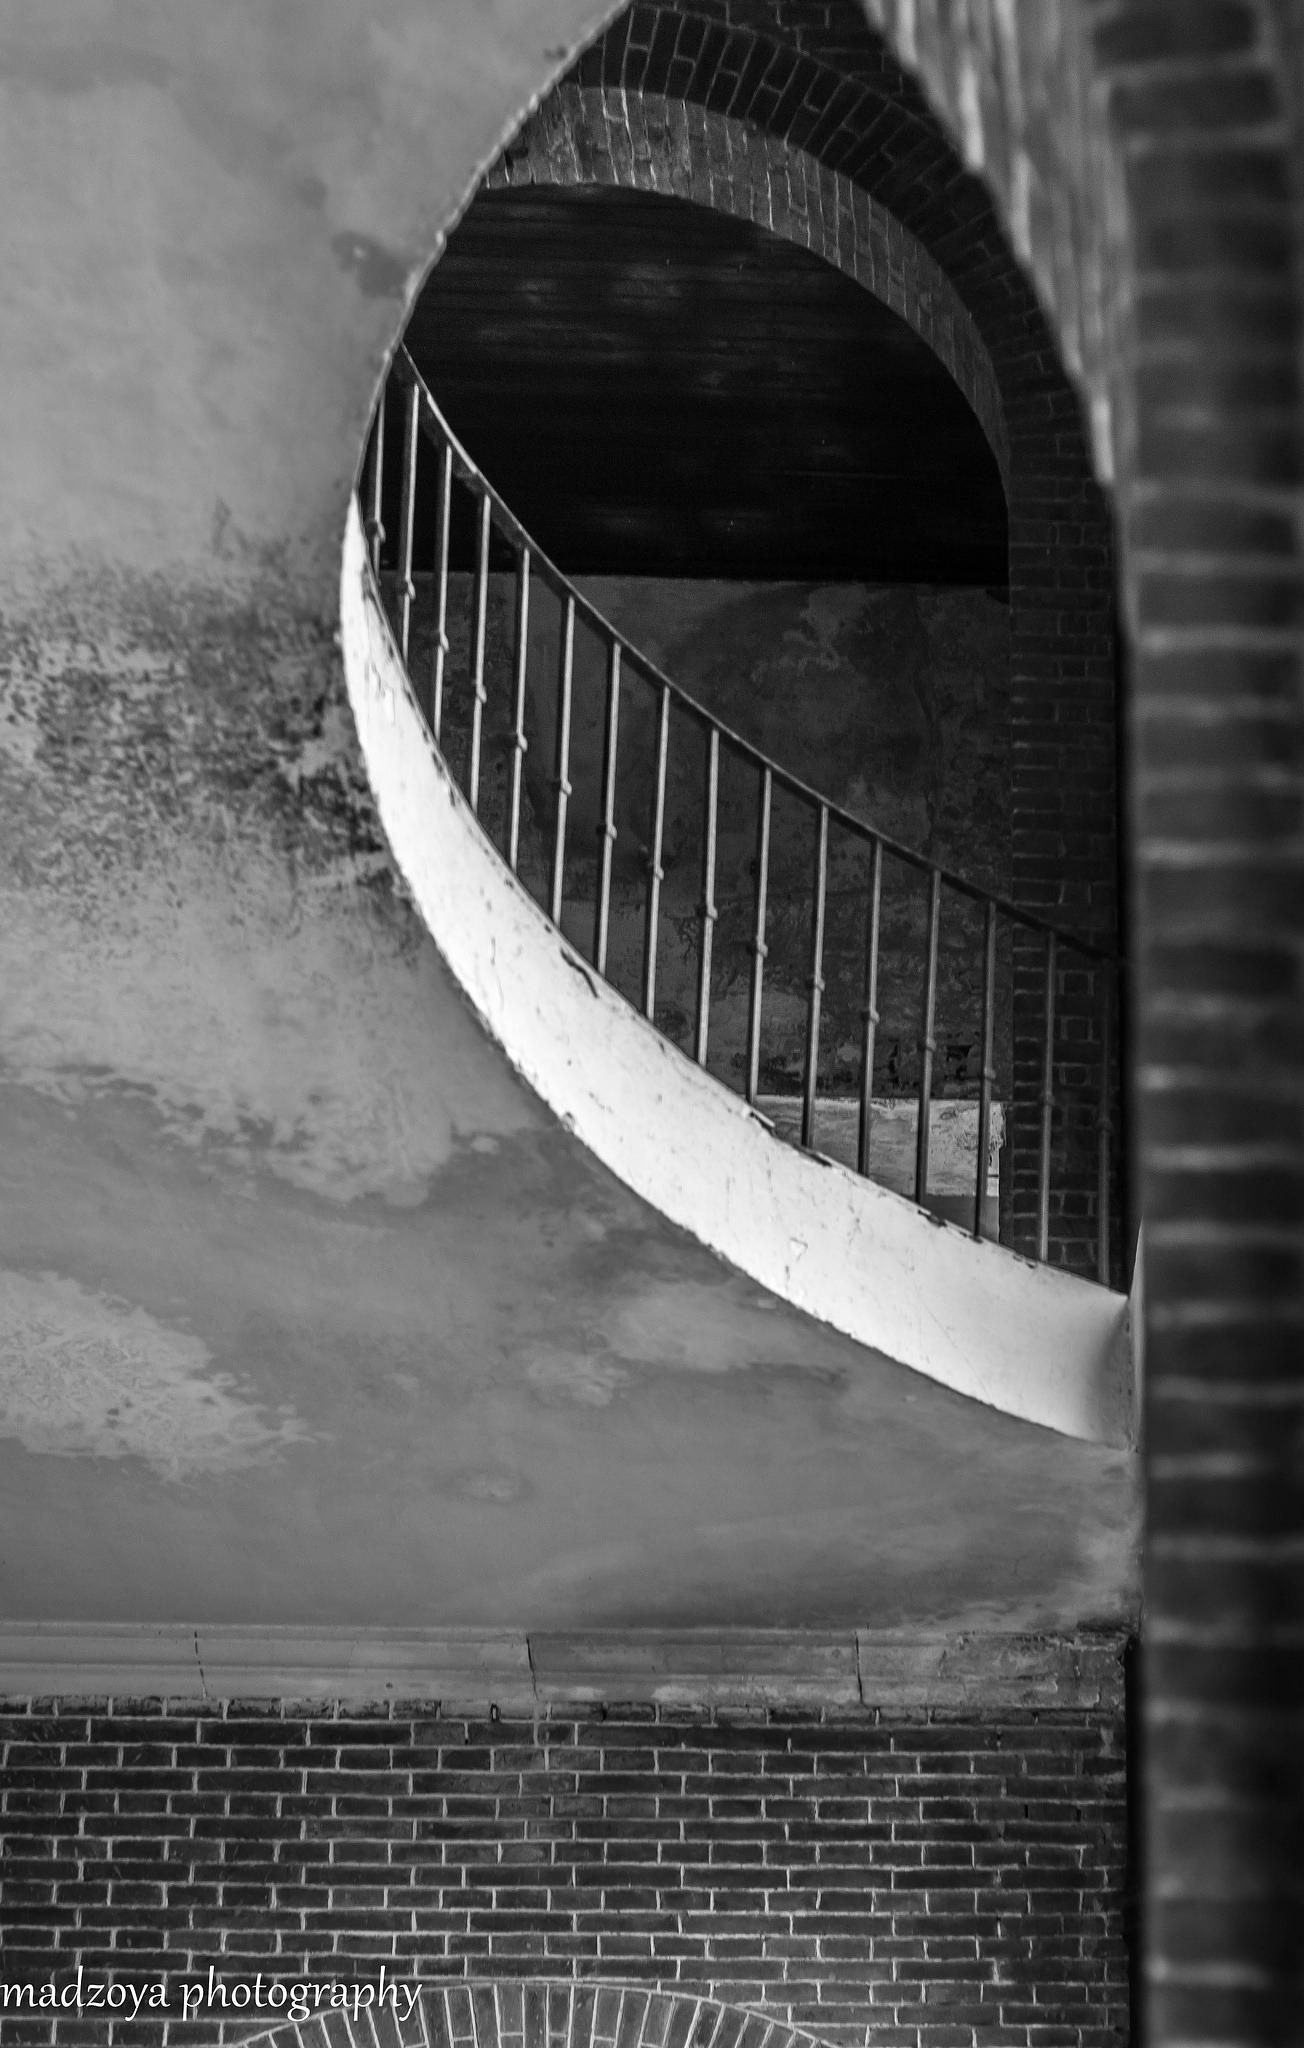 abstraction by ahmedgulshir